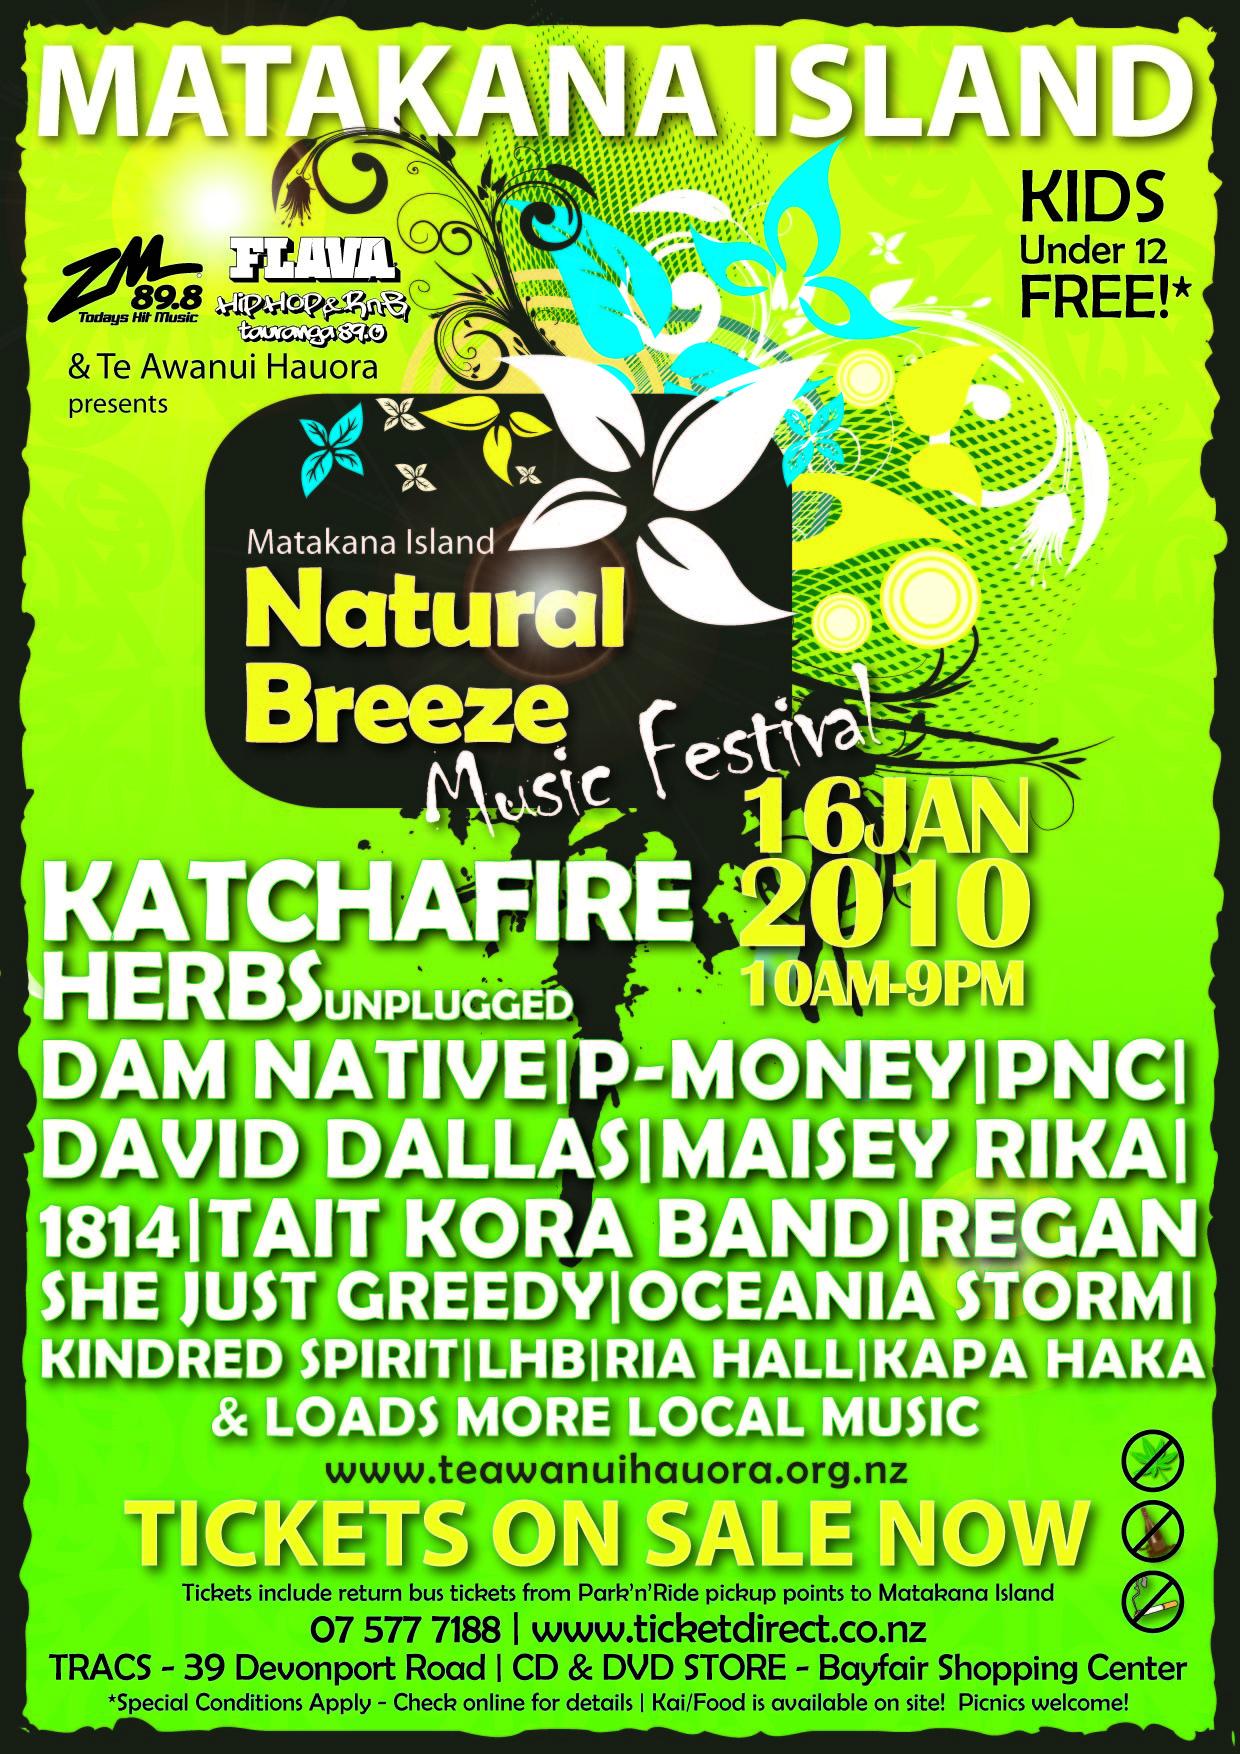 Matakana Island Festival 2010